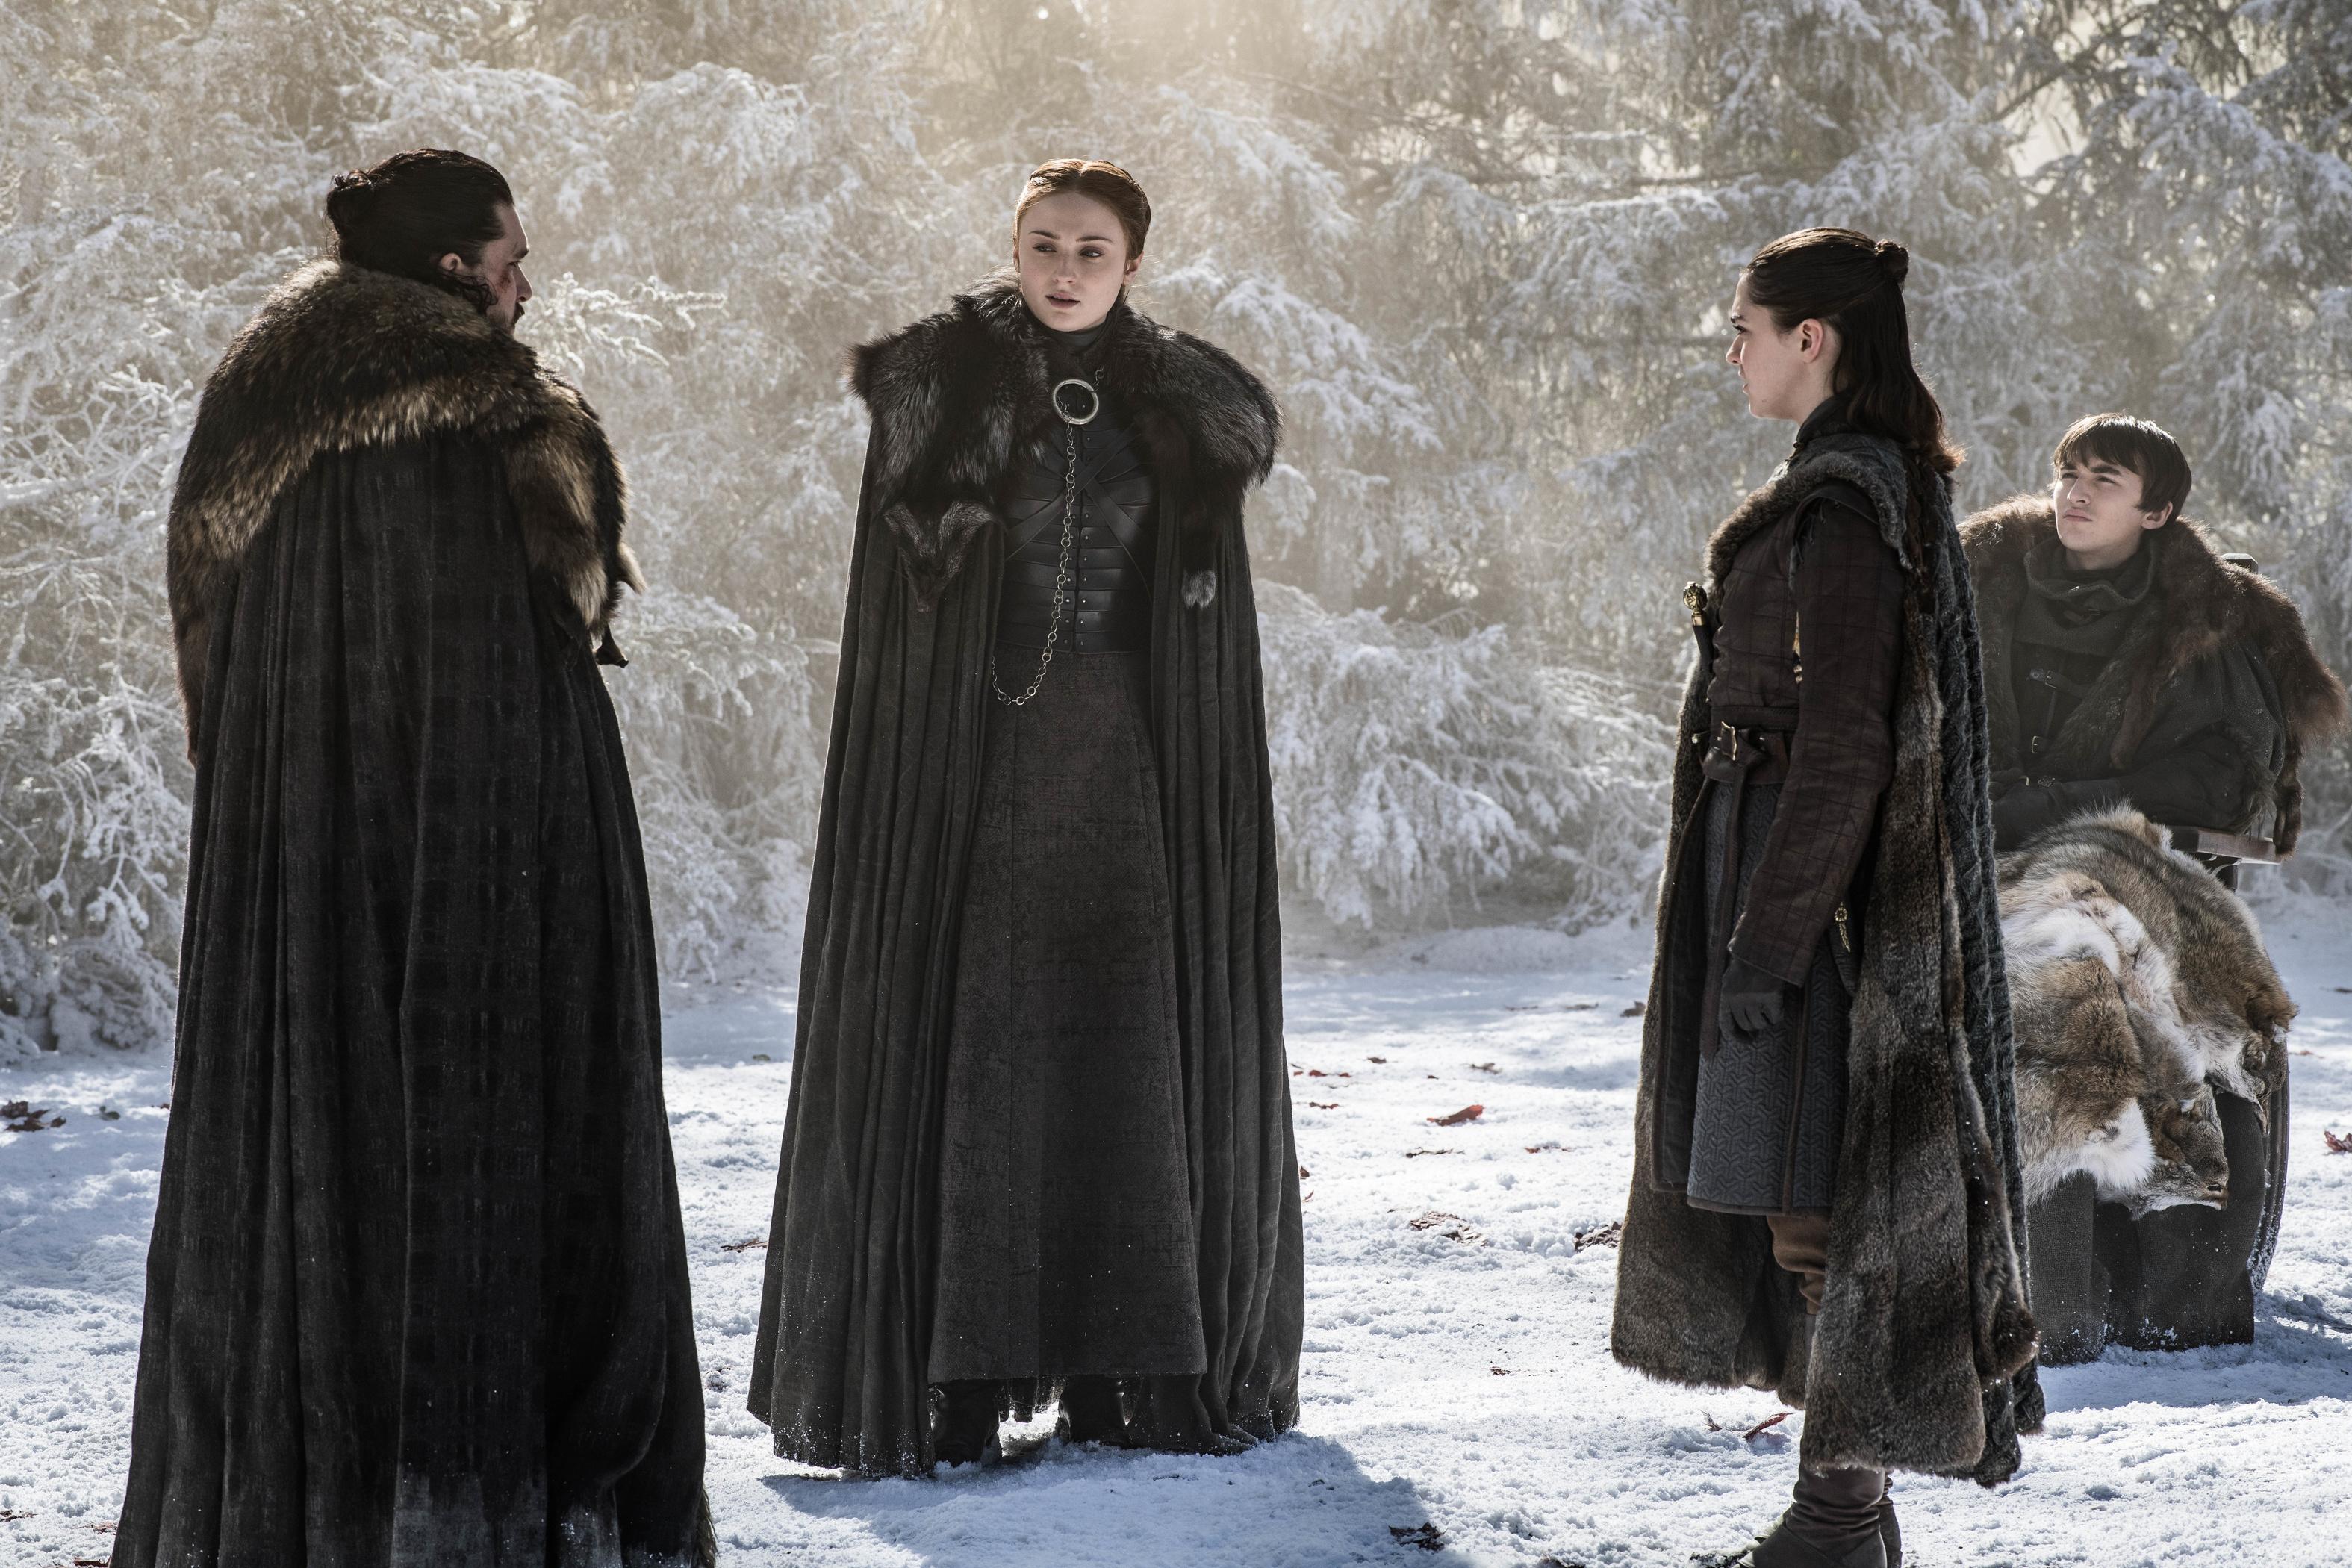 The Stark Siblings urge Jon to reconsider his loyalty